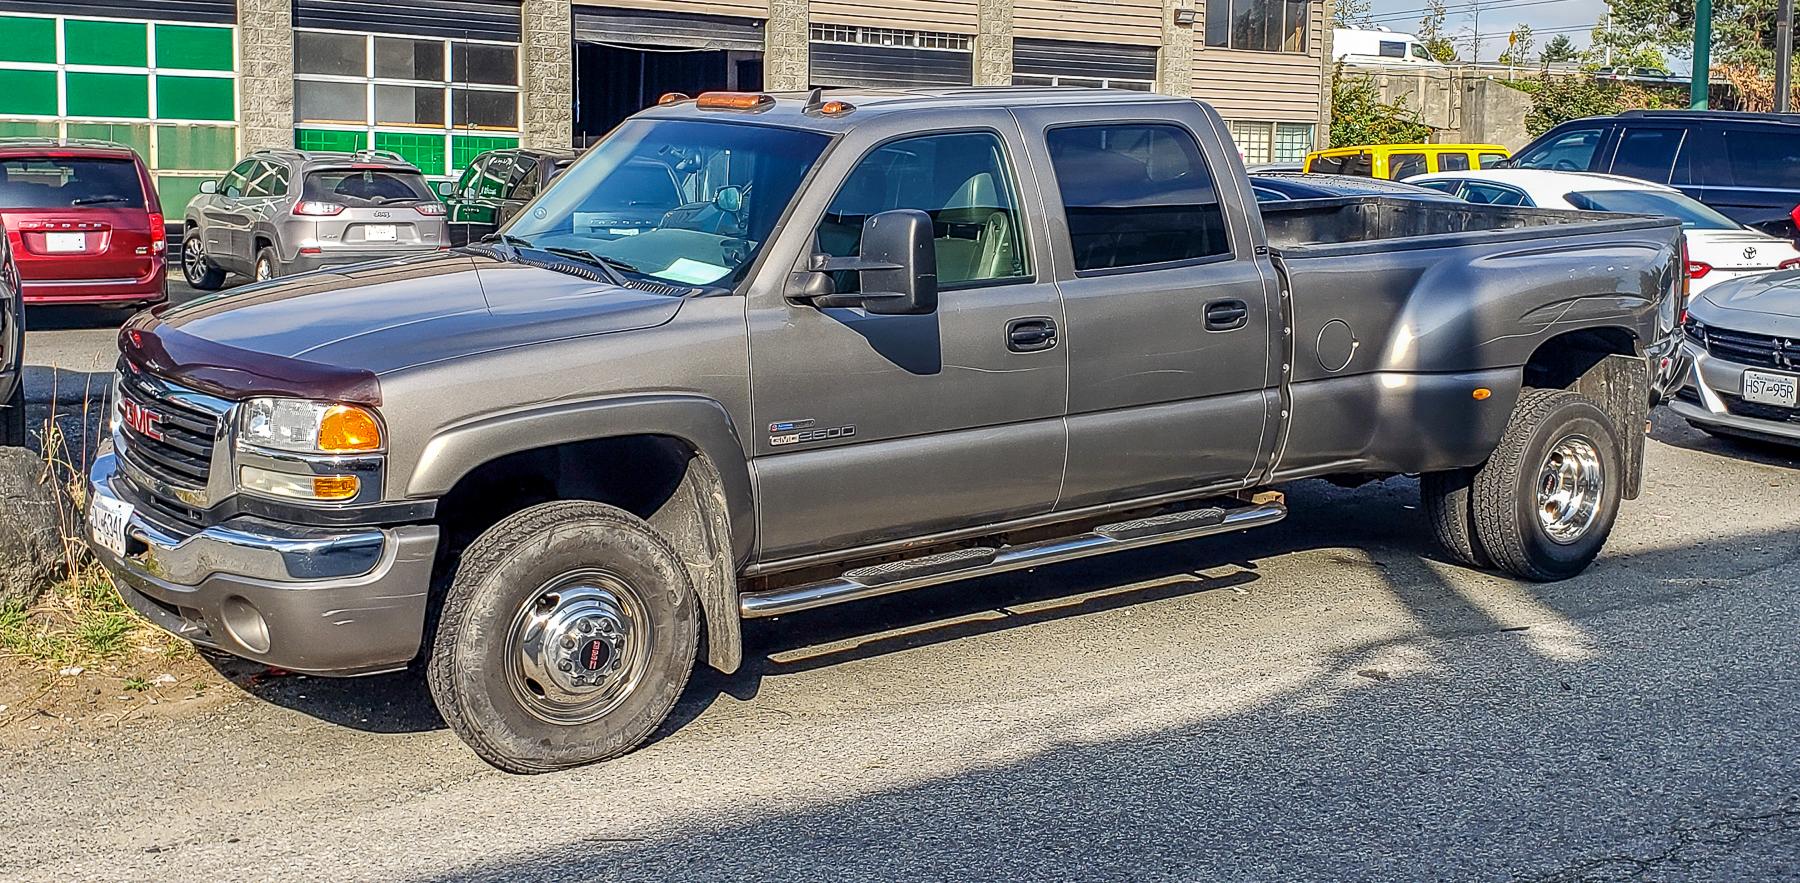 Blog - Pawlik Automotive Repair, Vancouver BC